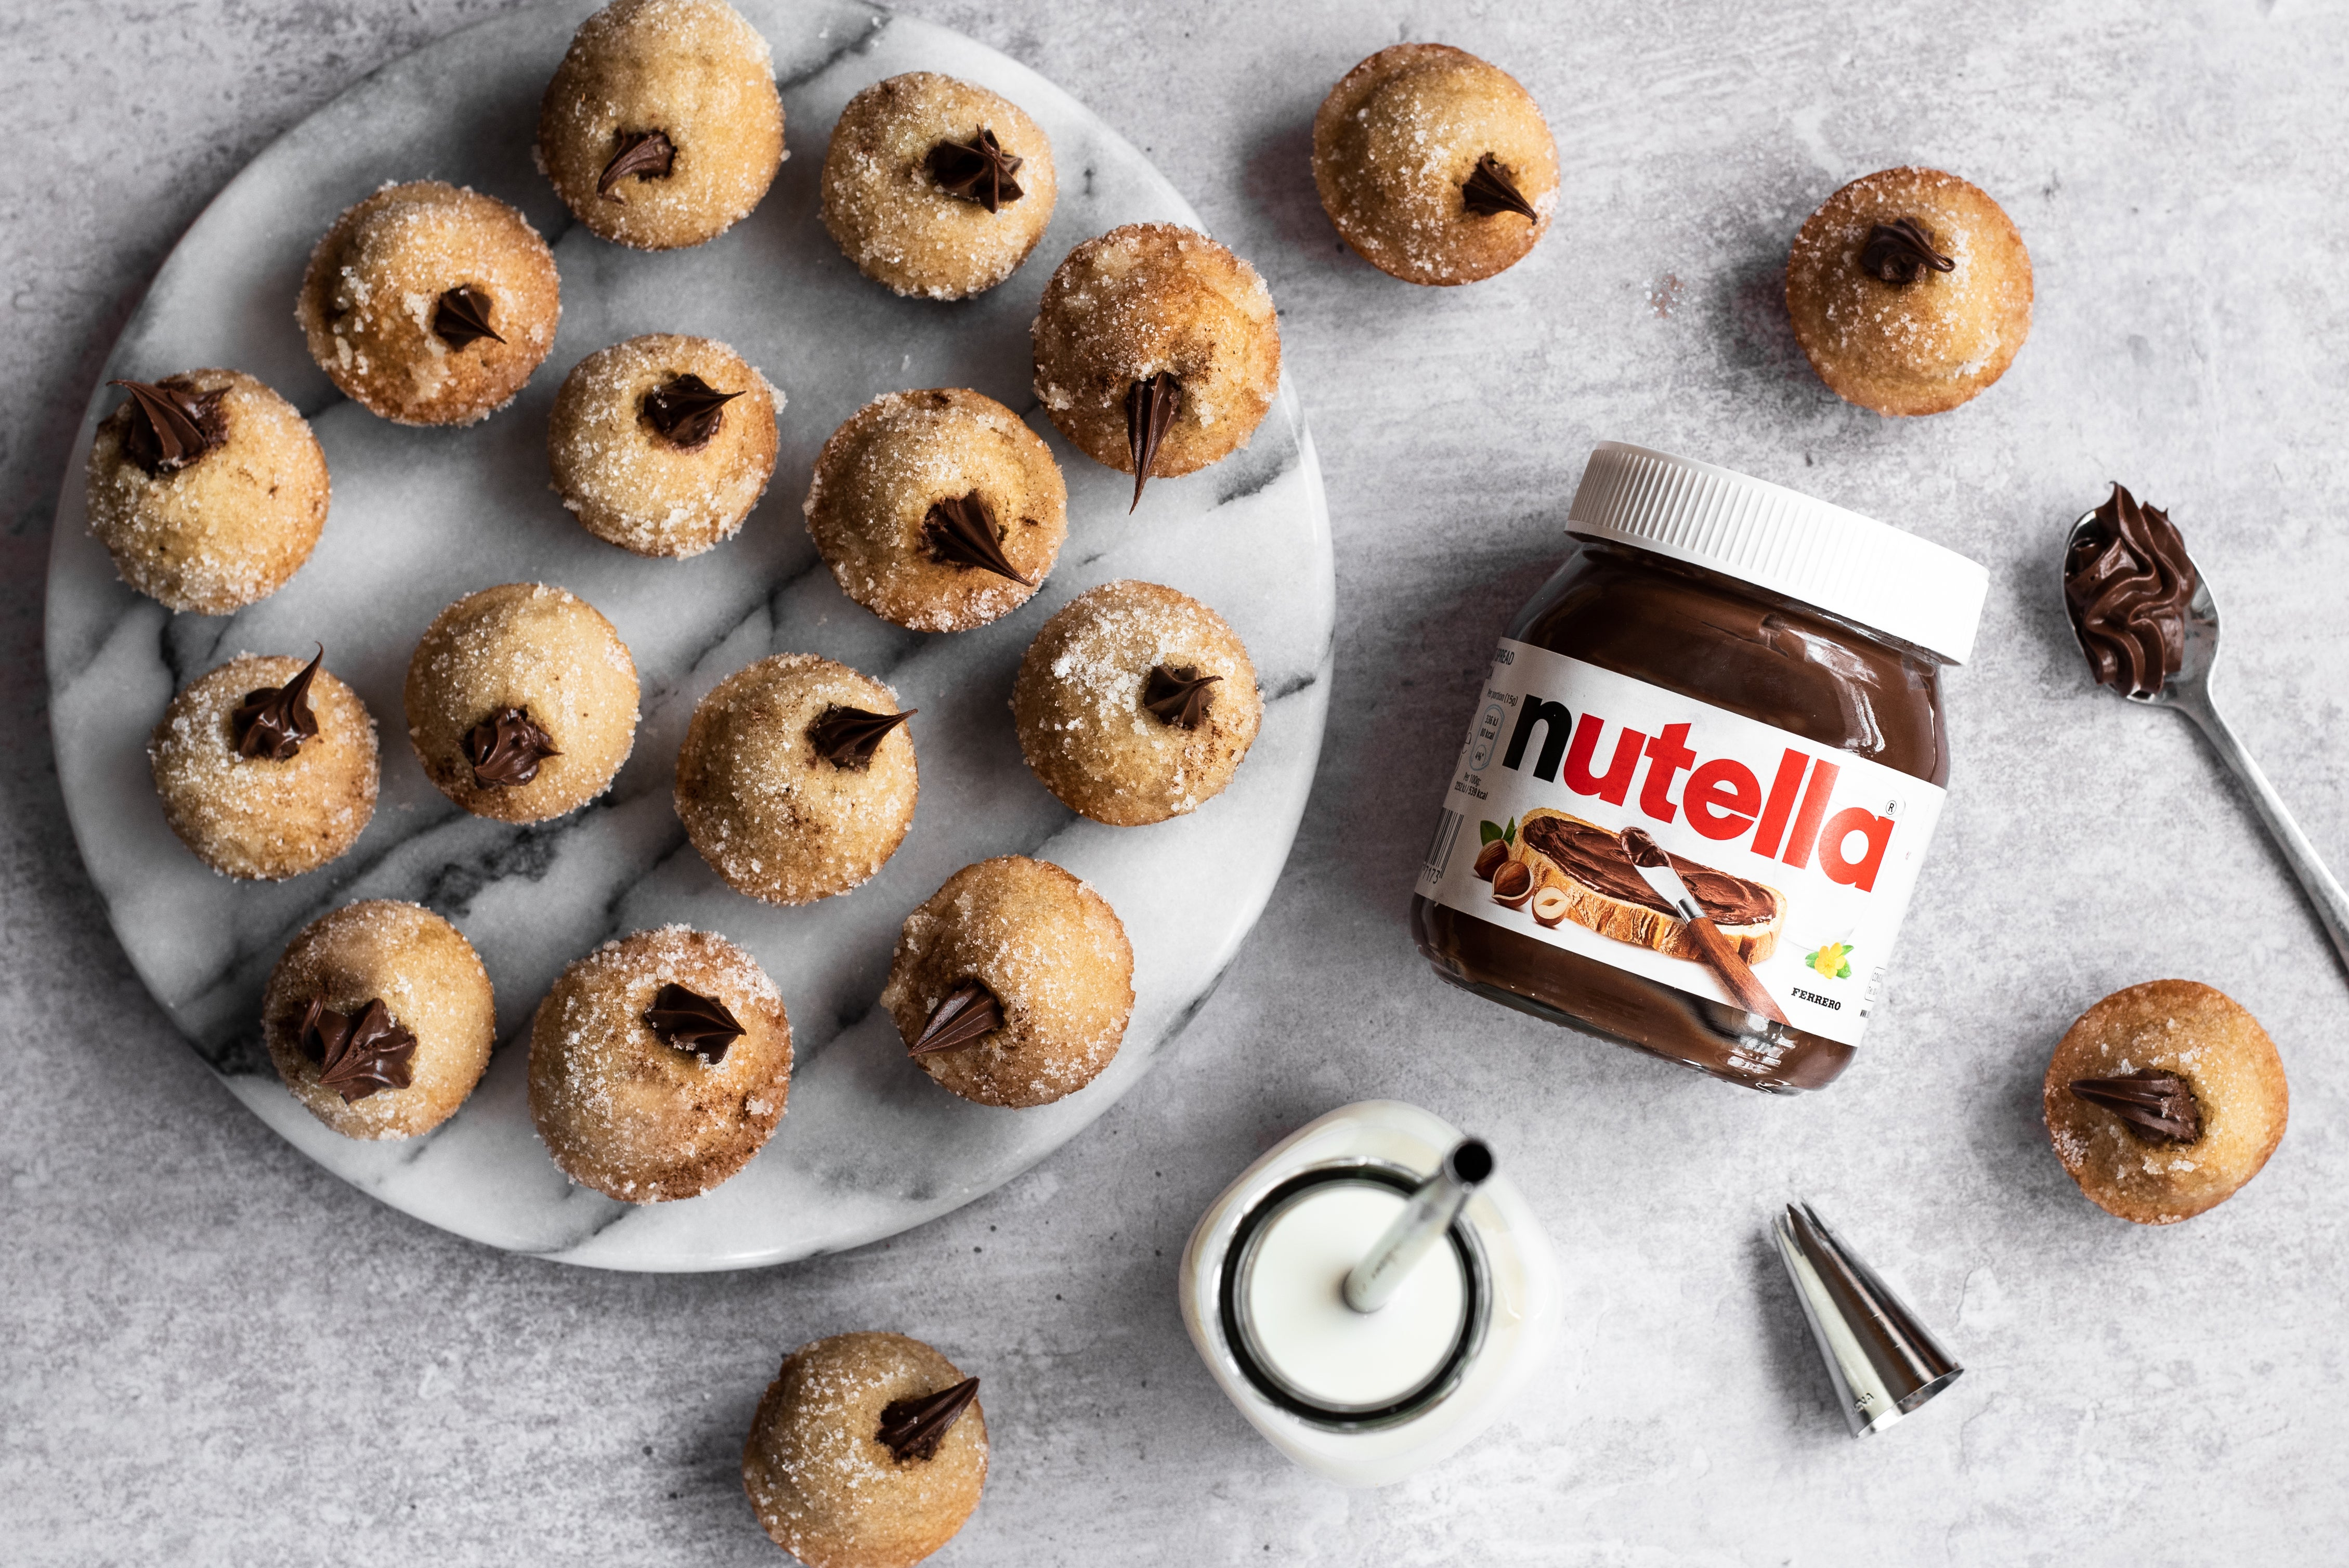 Nutella Filled Cinnamon Sugar Doughnut Holes